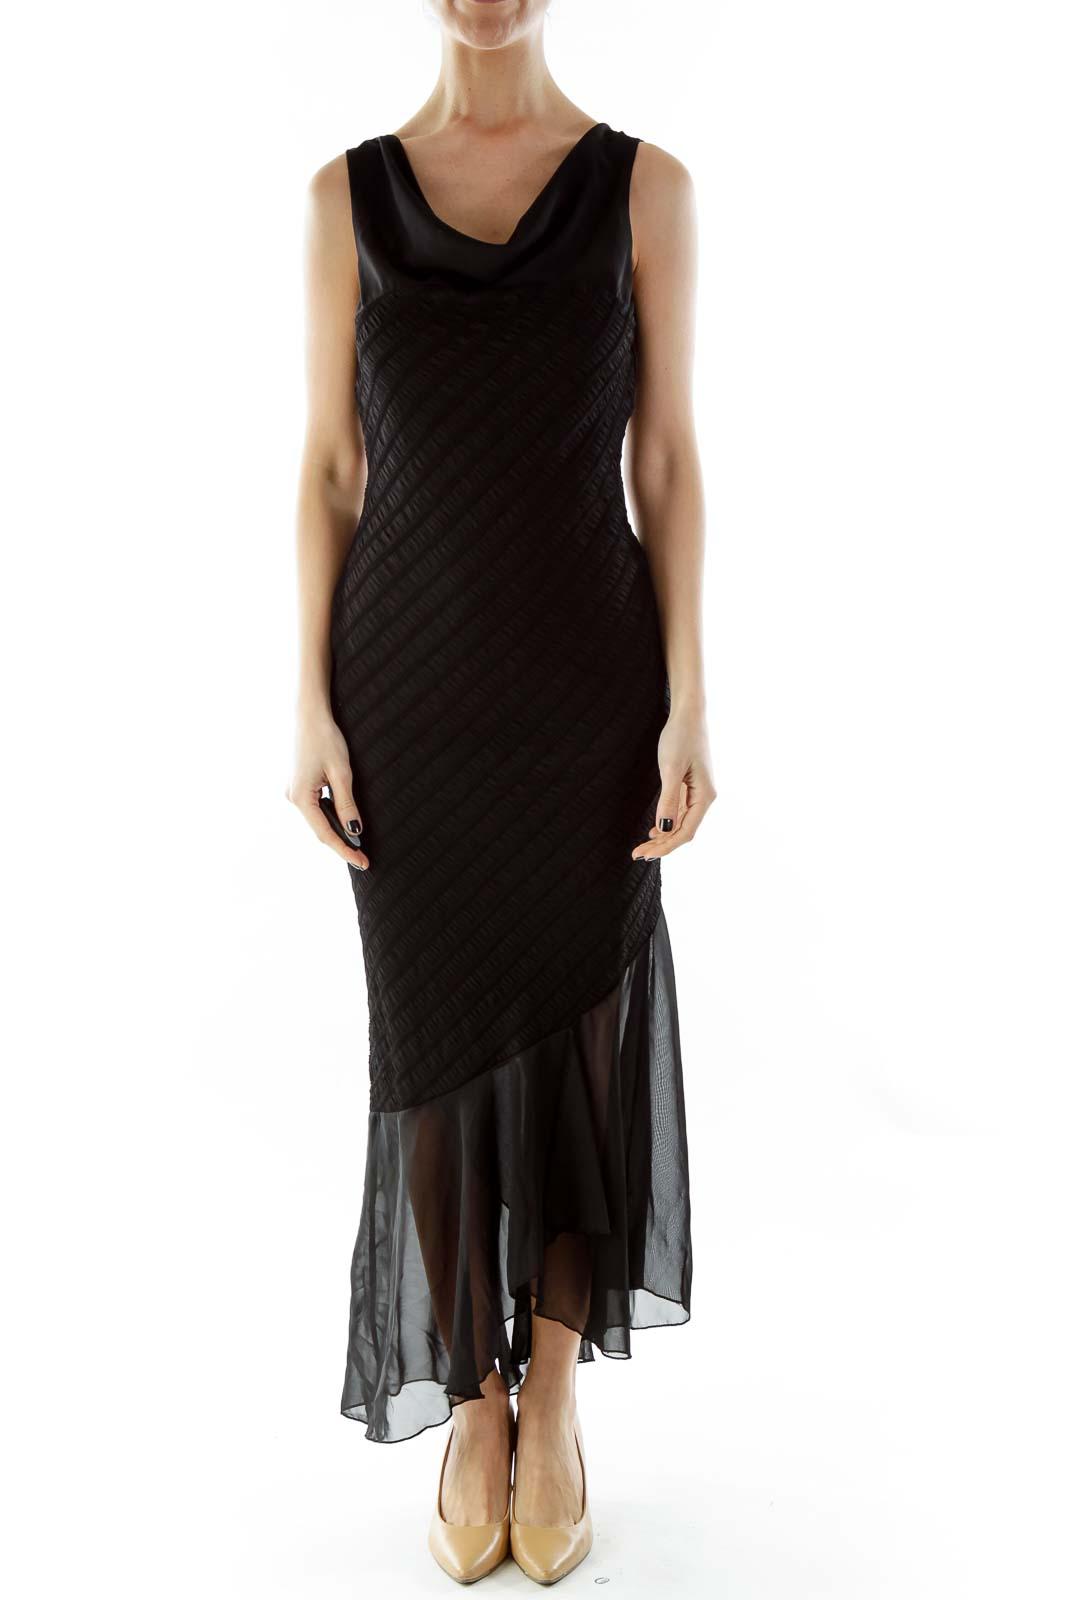 Black Scrunched Sleeveless Dress